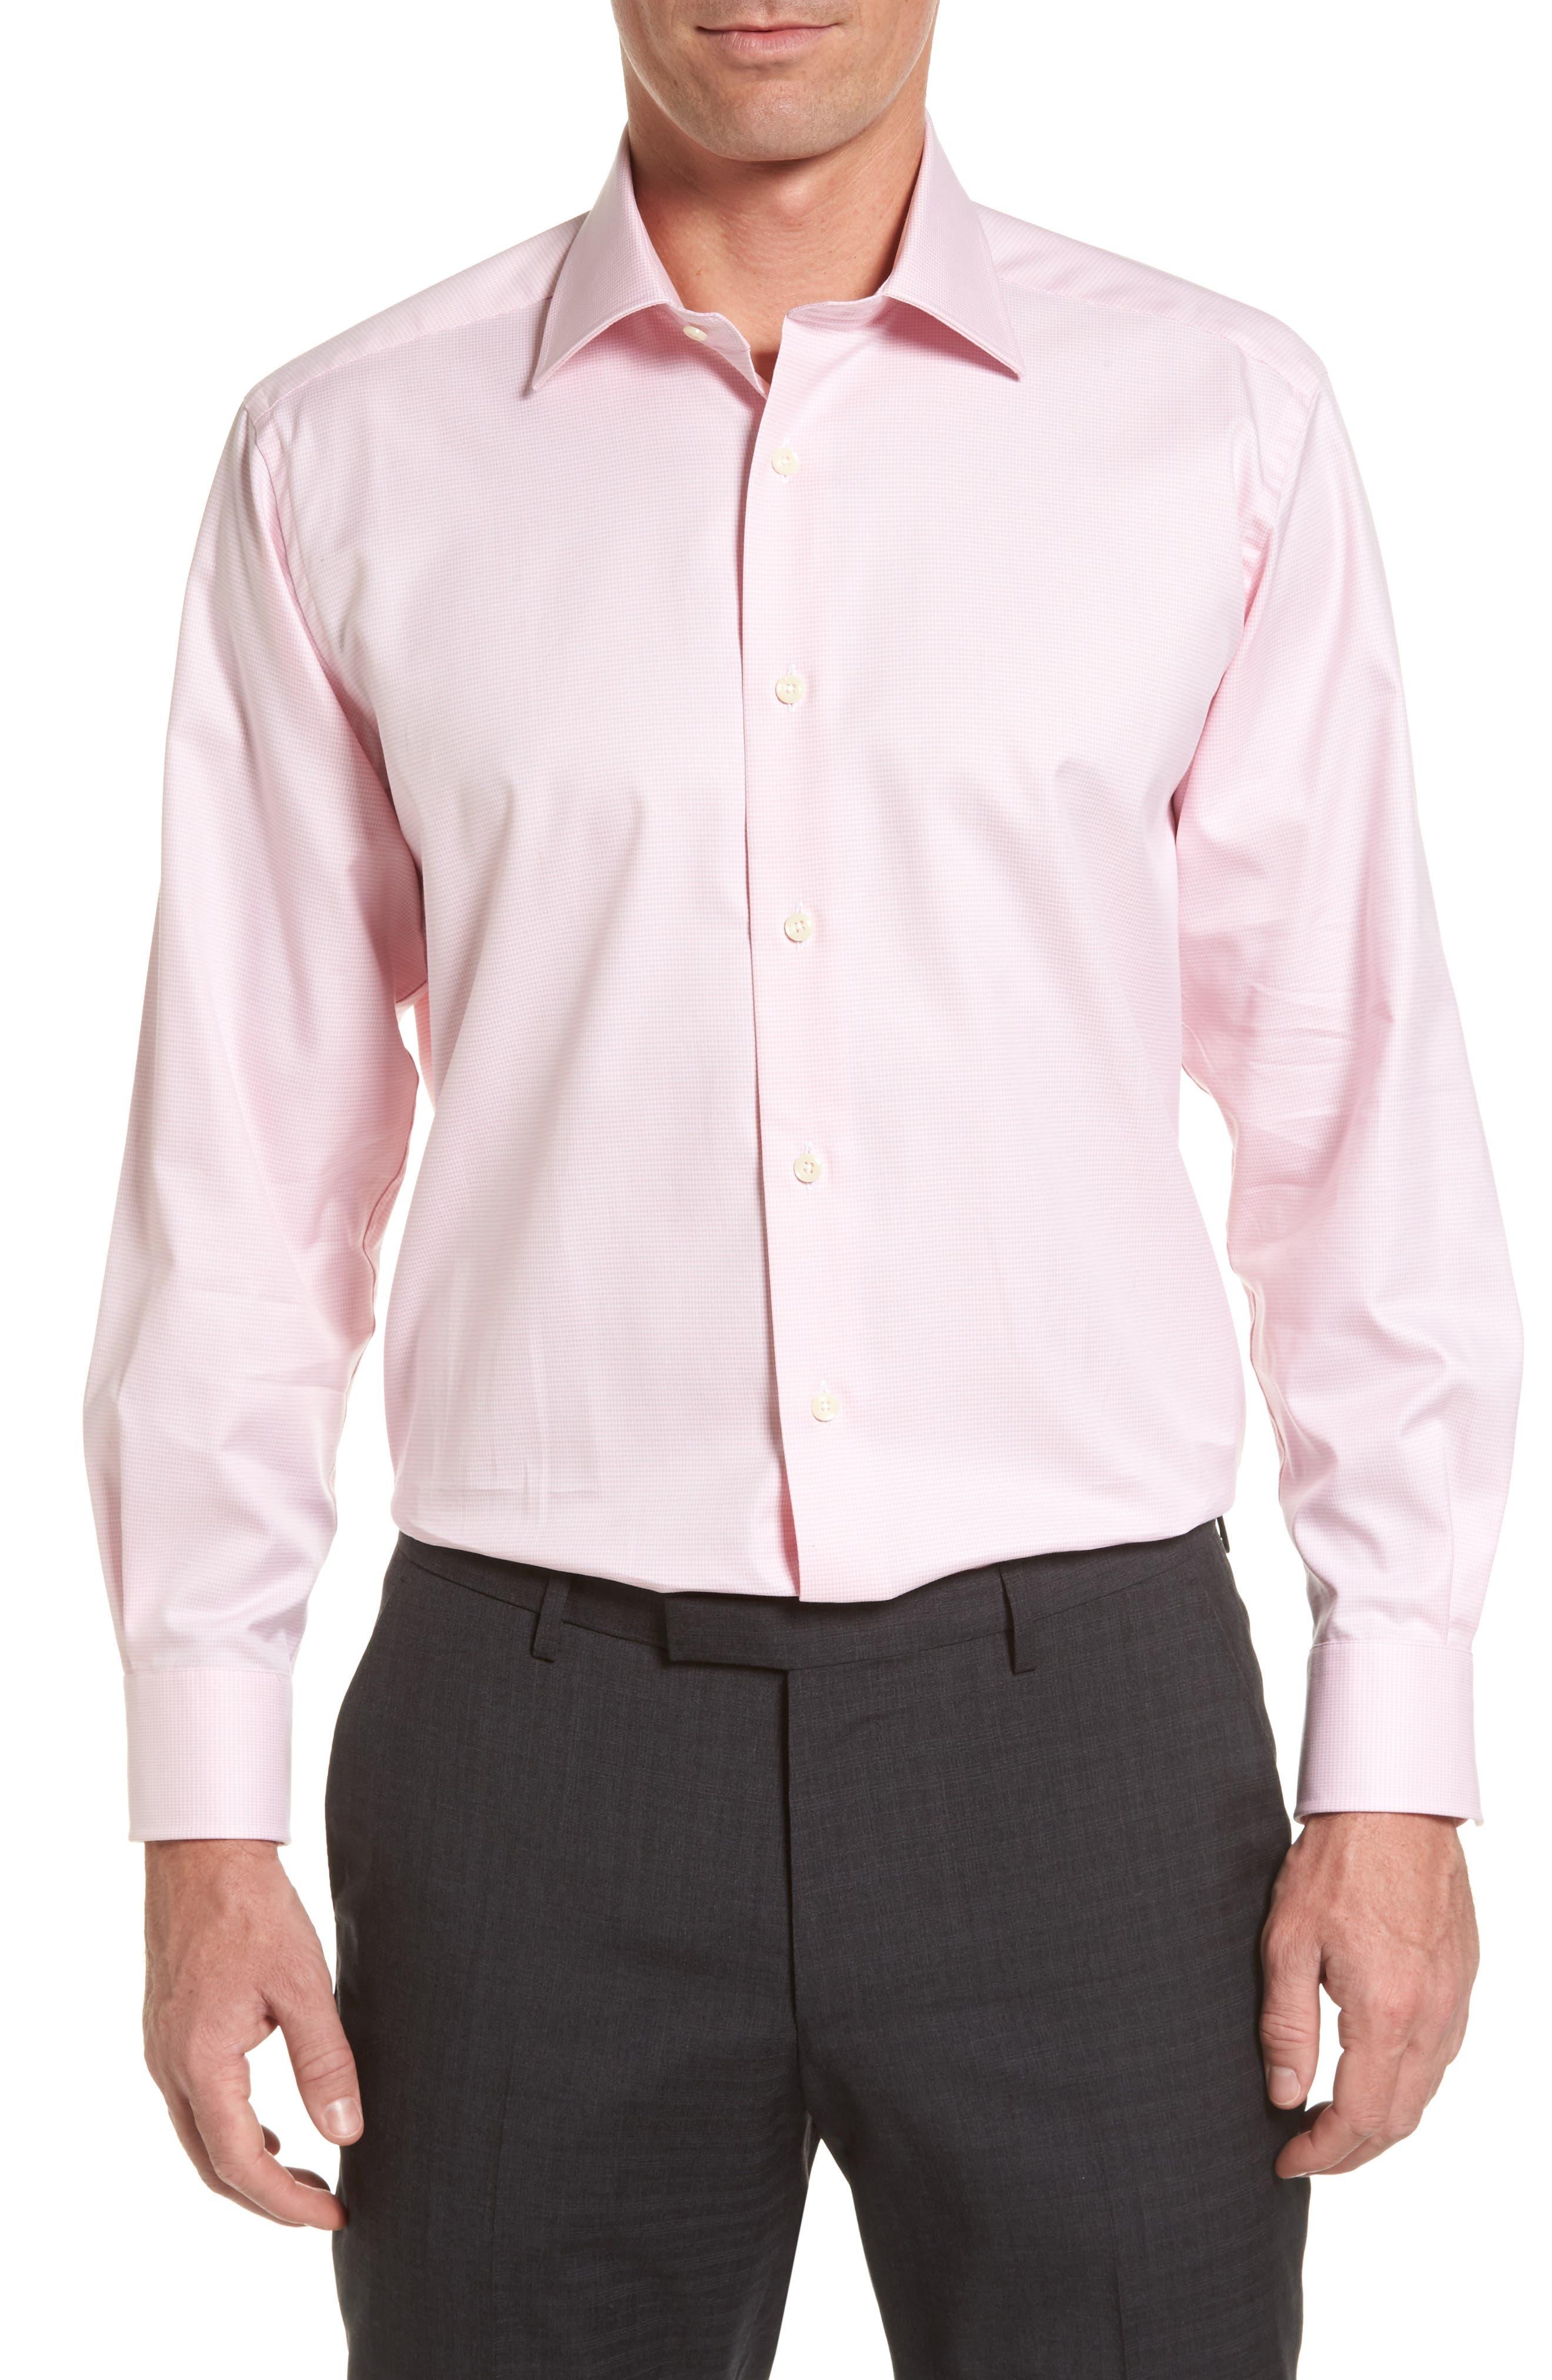 Regular Fit Houndstooth Dress Shirt,                             Main thumbnail 1, color,                             650